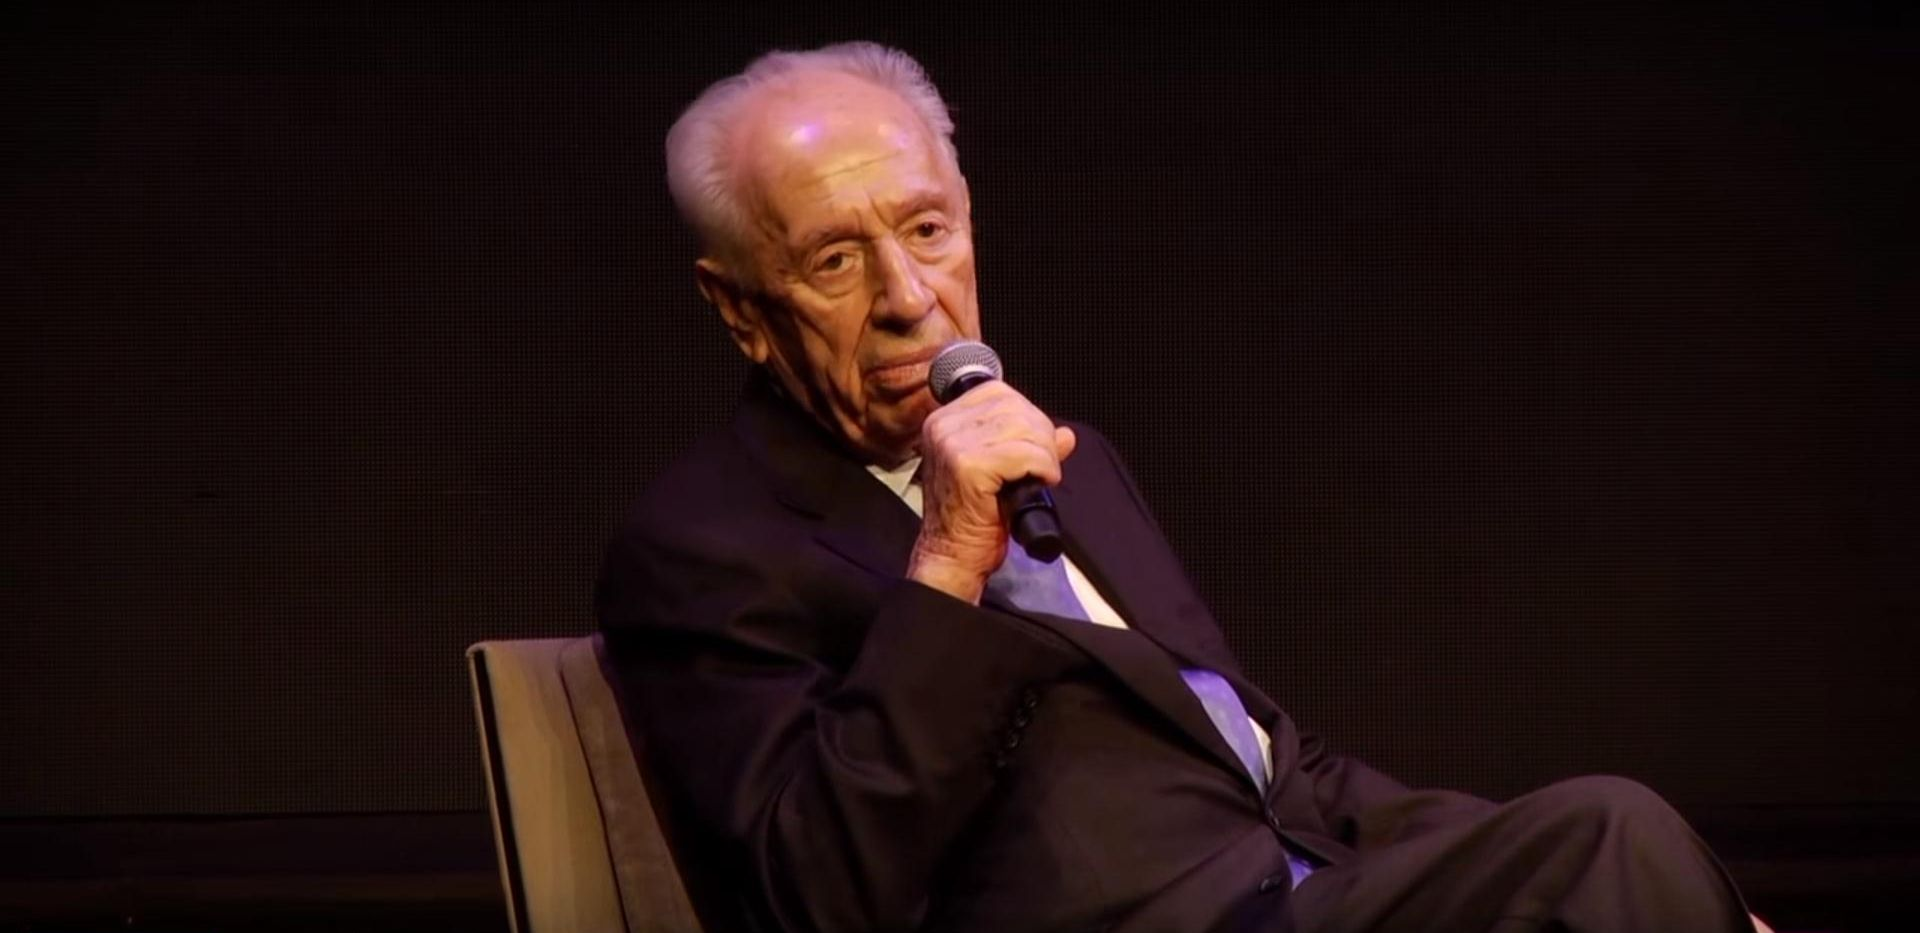 NA PROMATRANJU Bivši izraelski predsjednik Shimon Peres (92) završio u bolnici